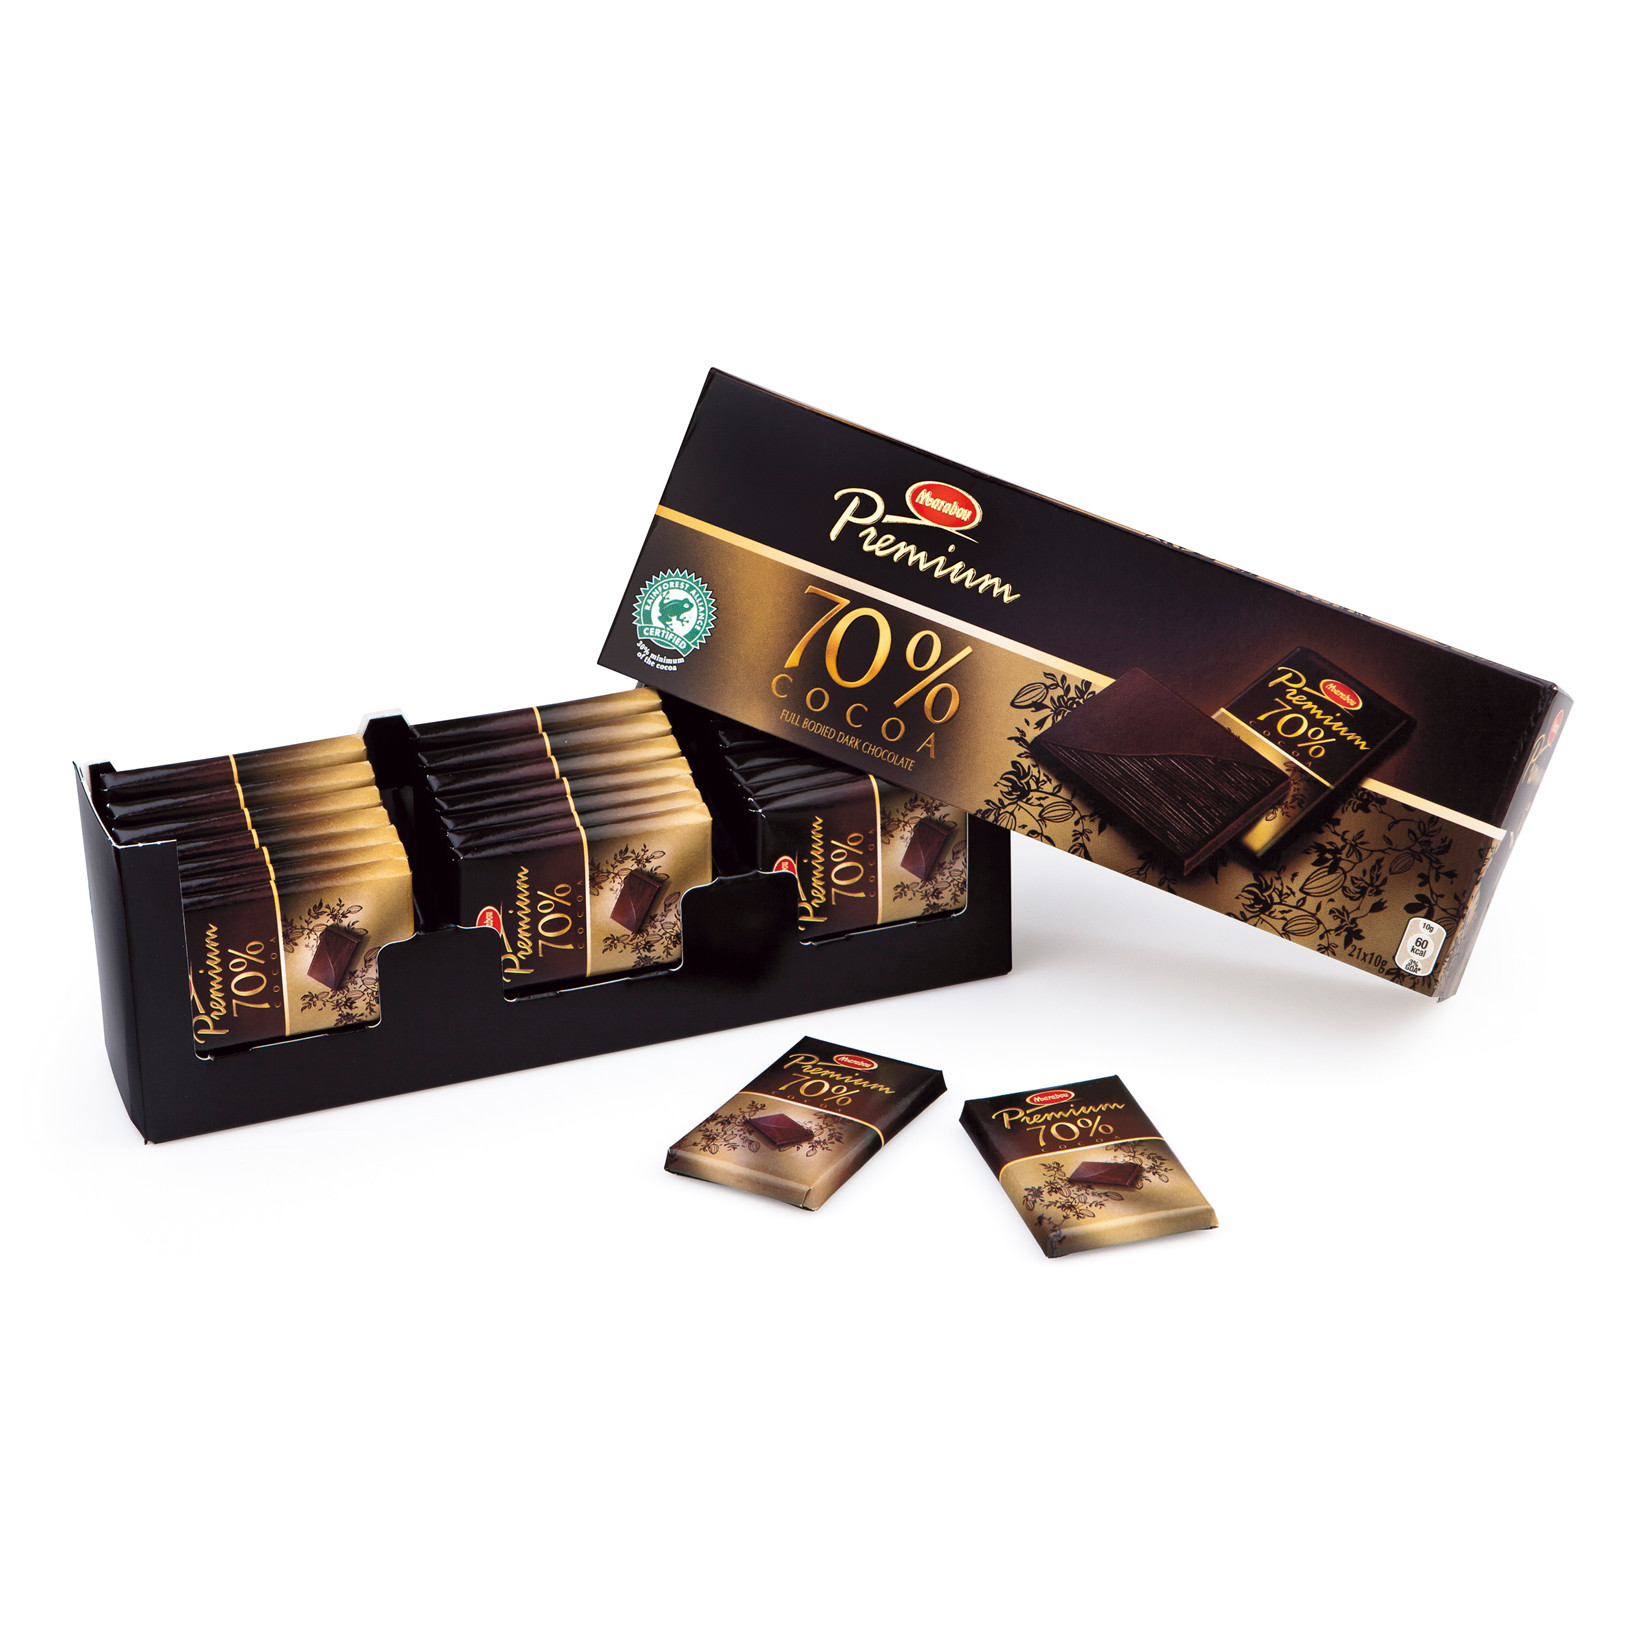 Marabou Premium gaveæske mørk - 12 æsker i en pakke